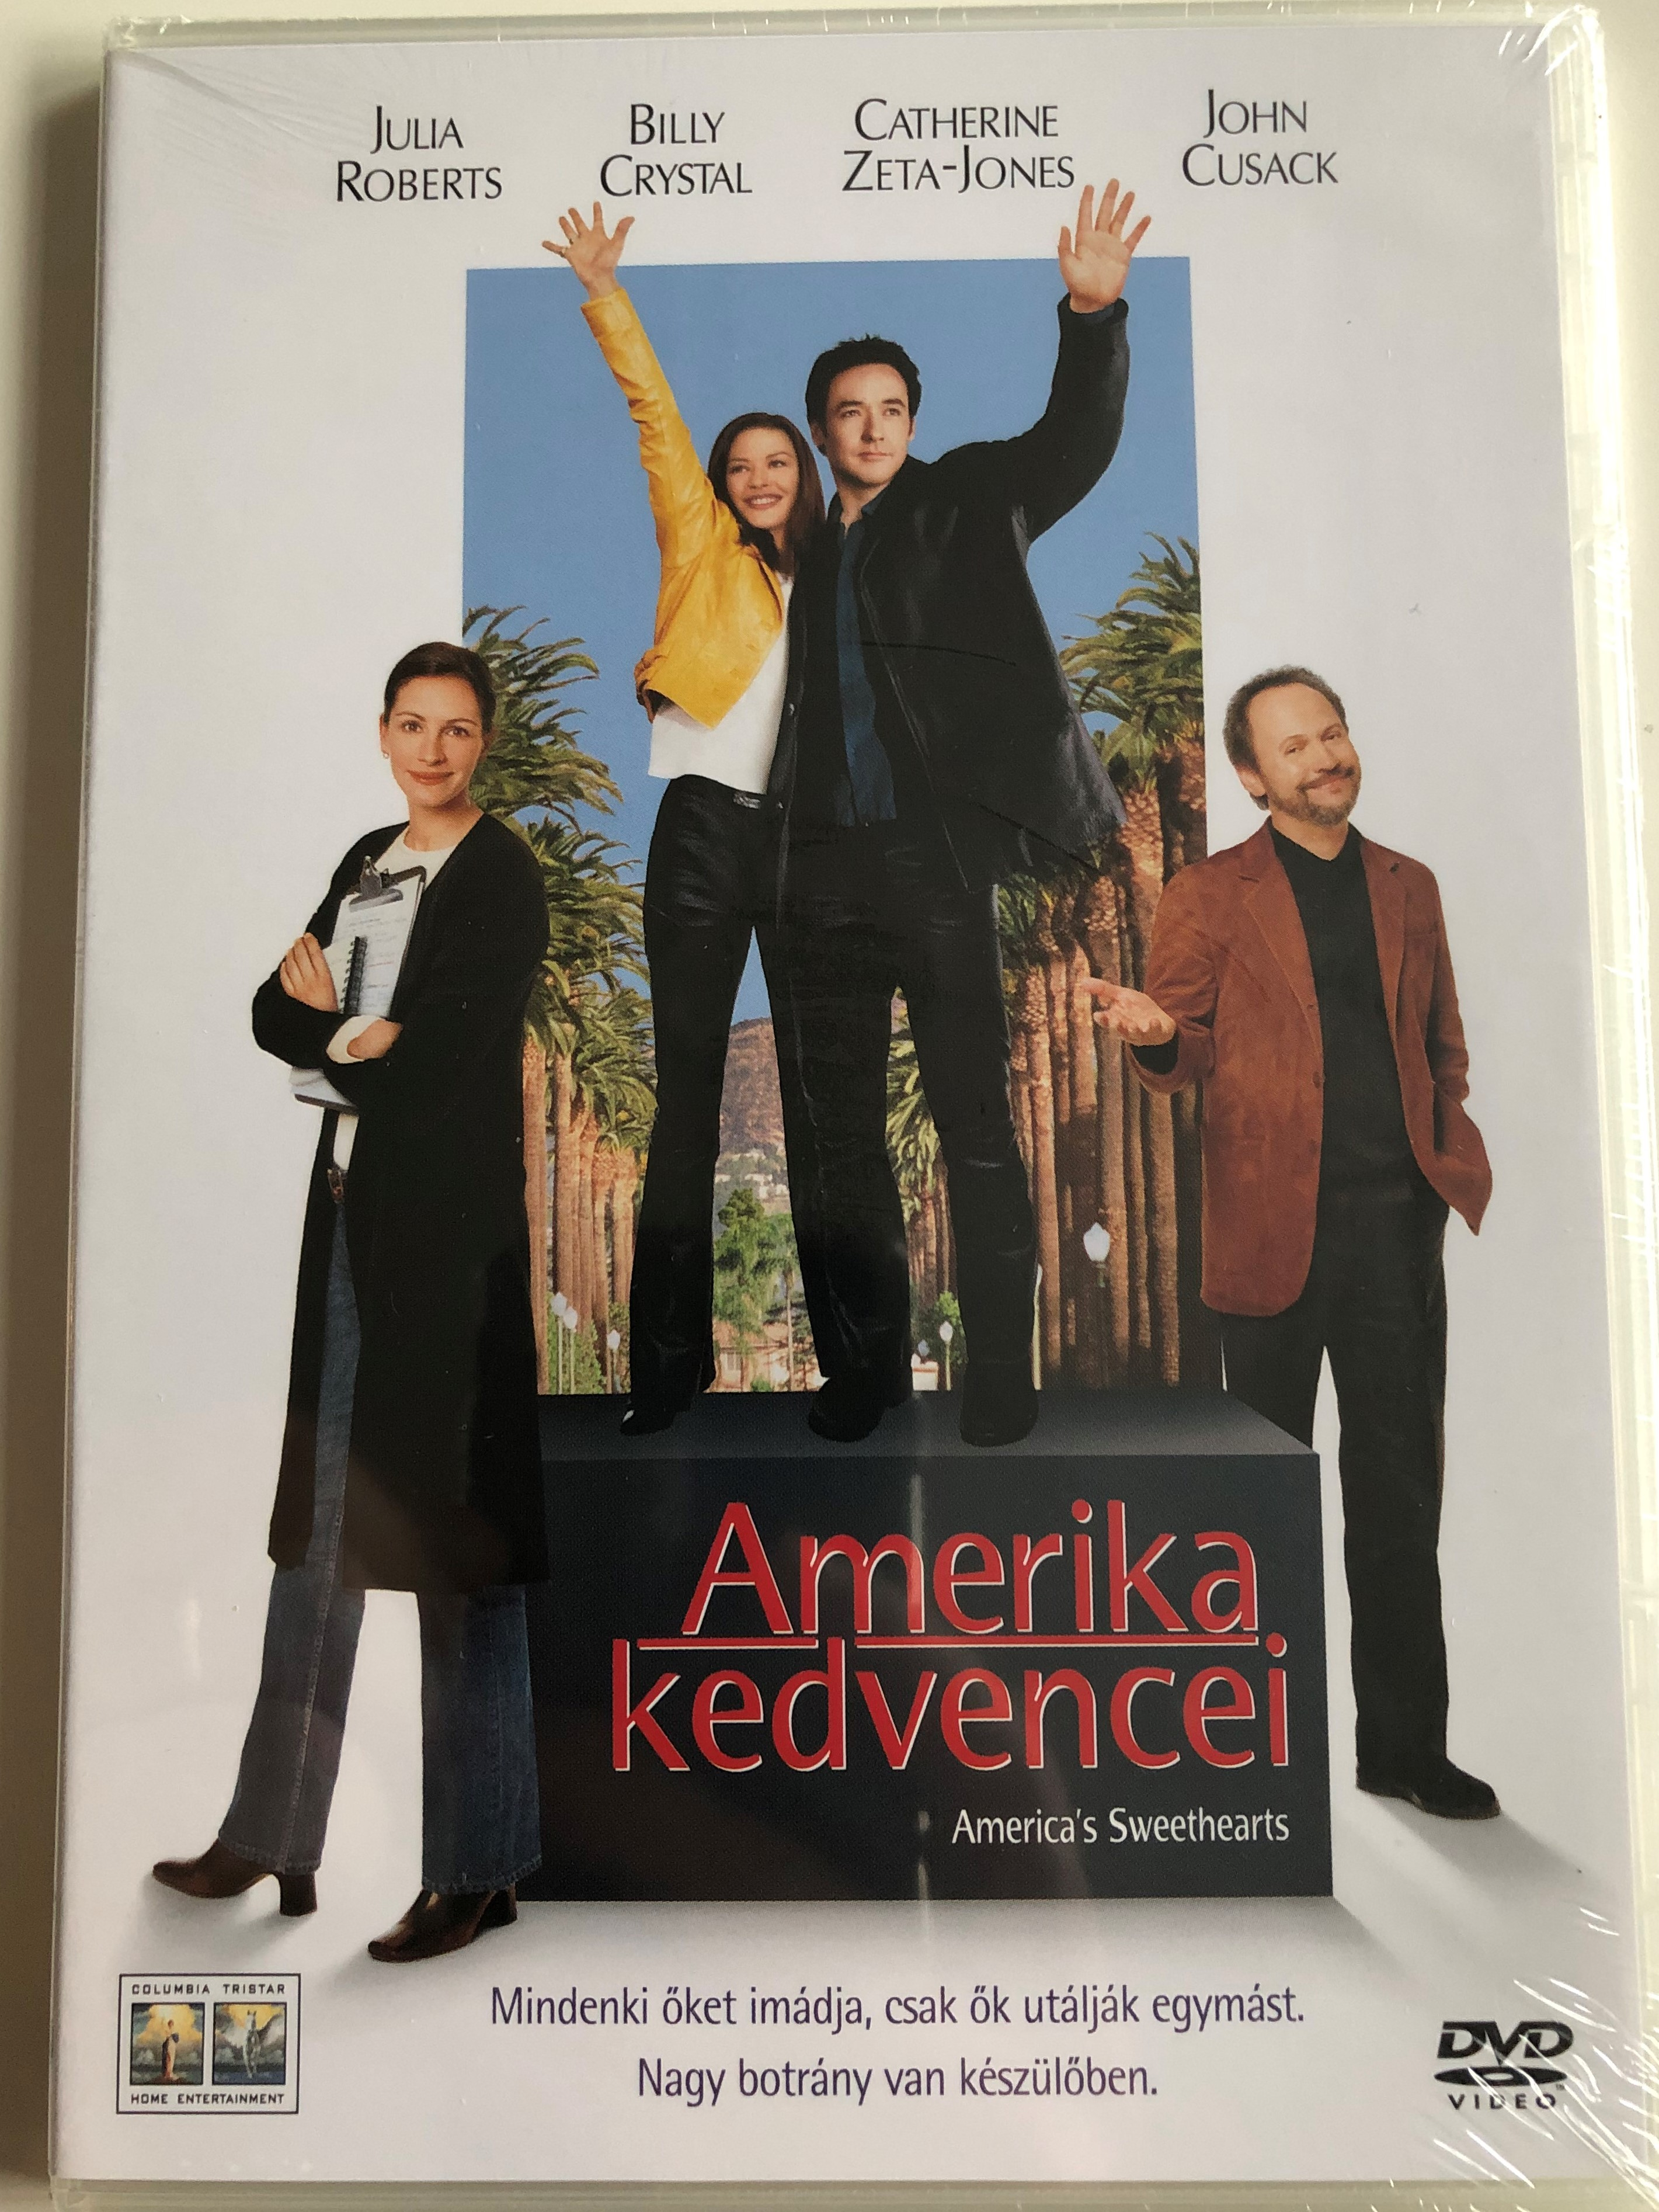 america-s-sweethearts-dvd-2001-amerika-kedvencei-1.jpg